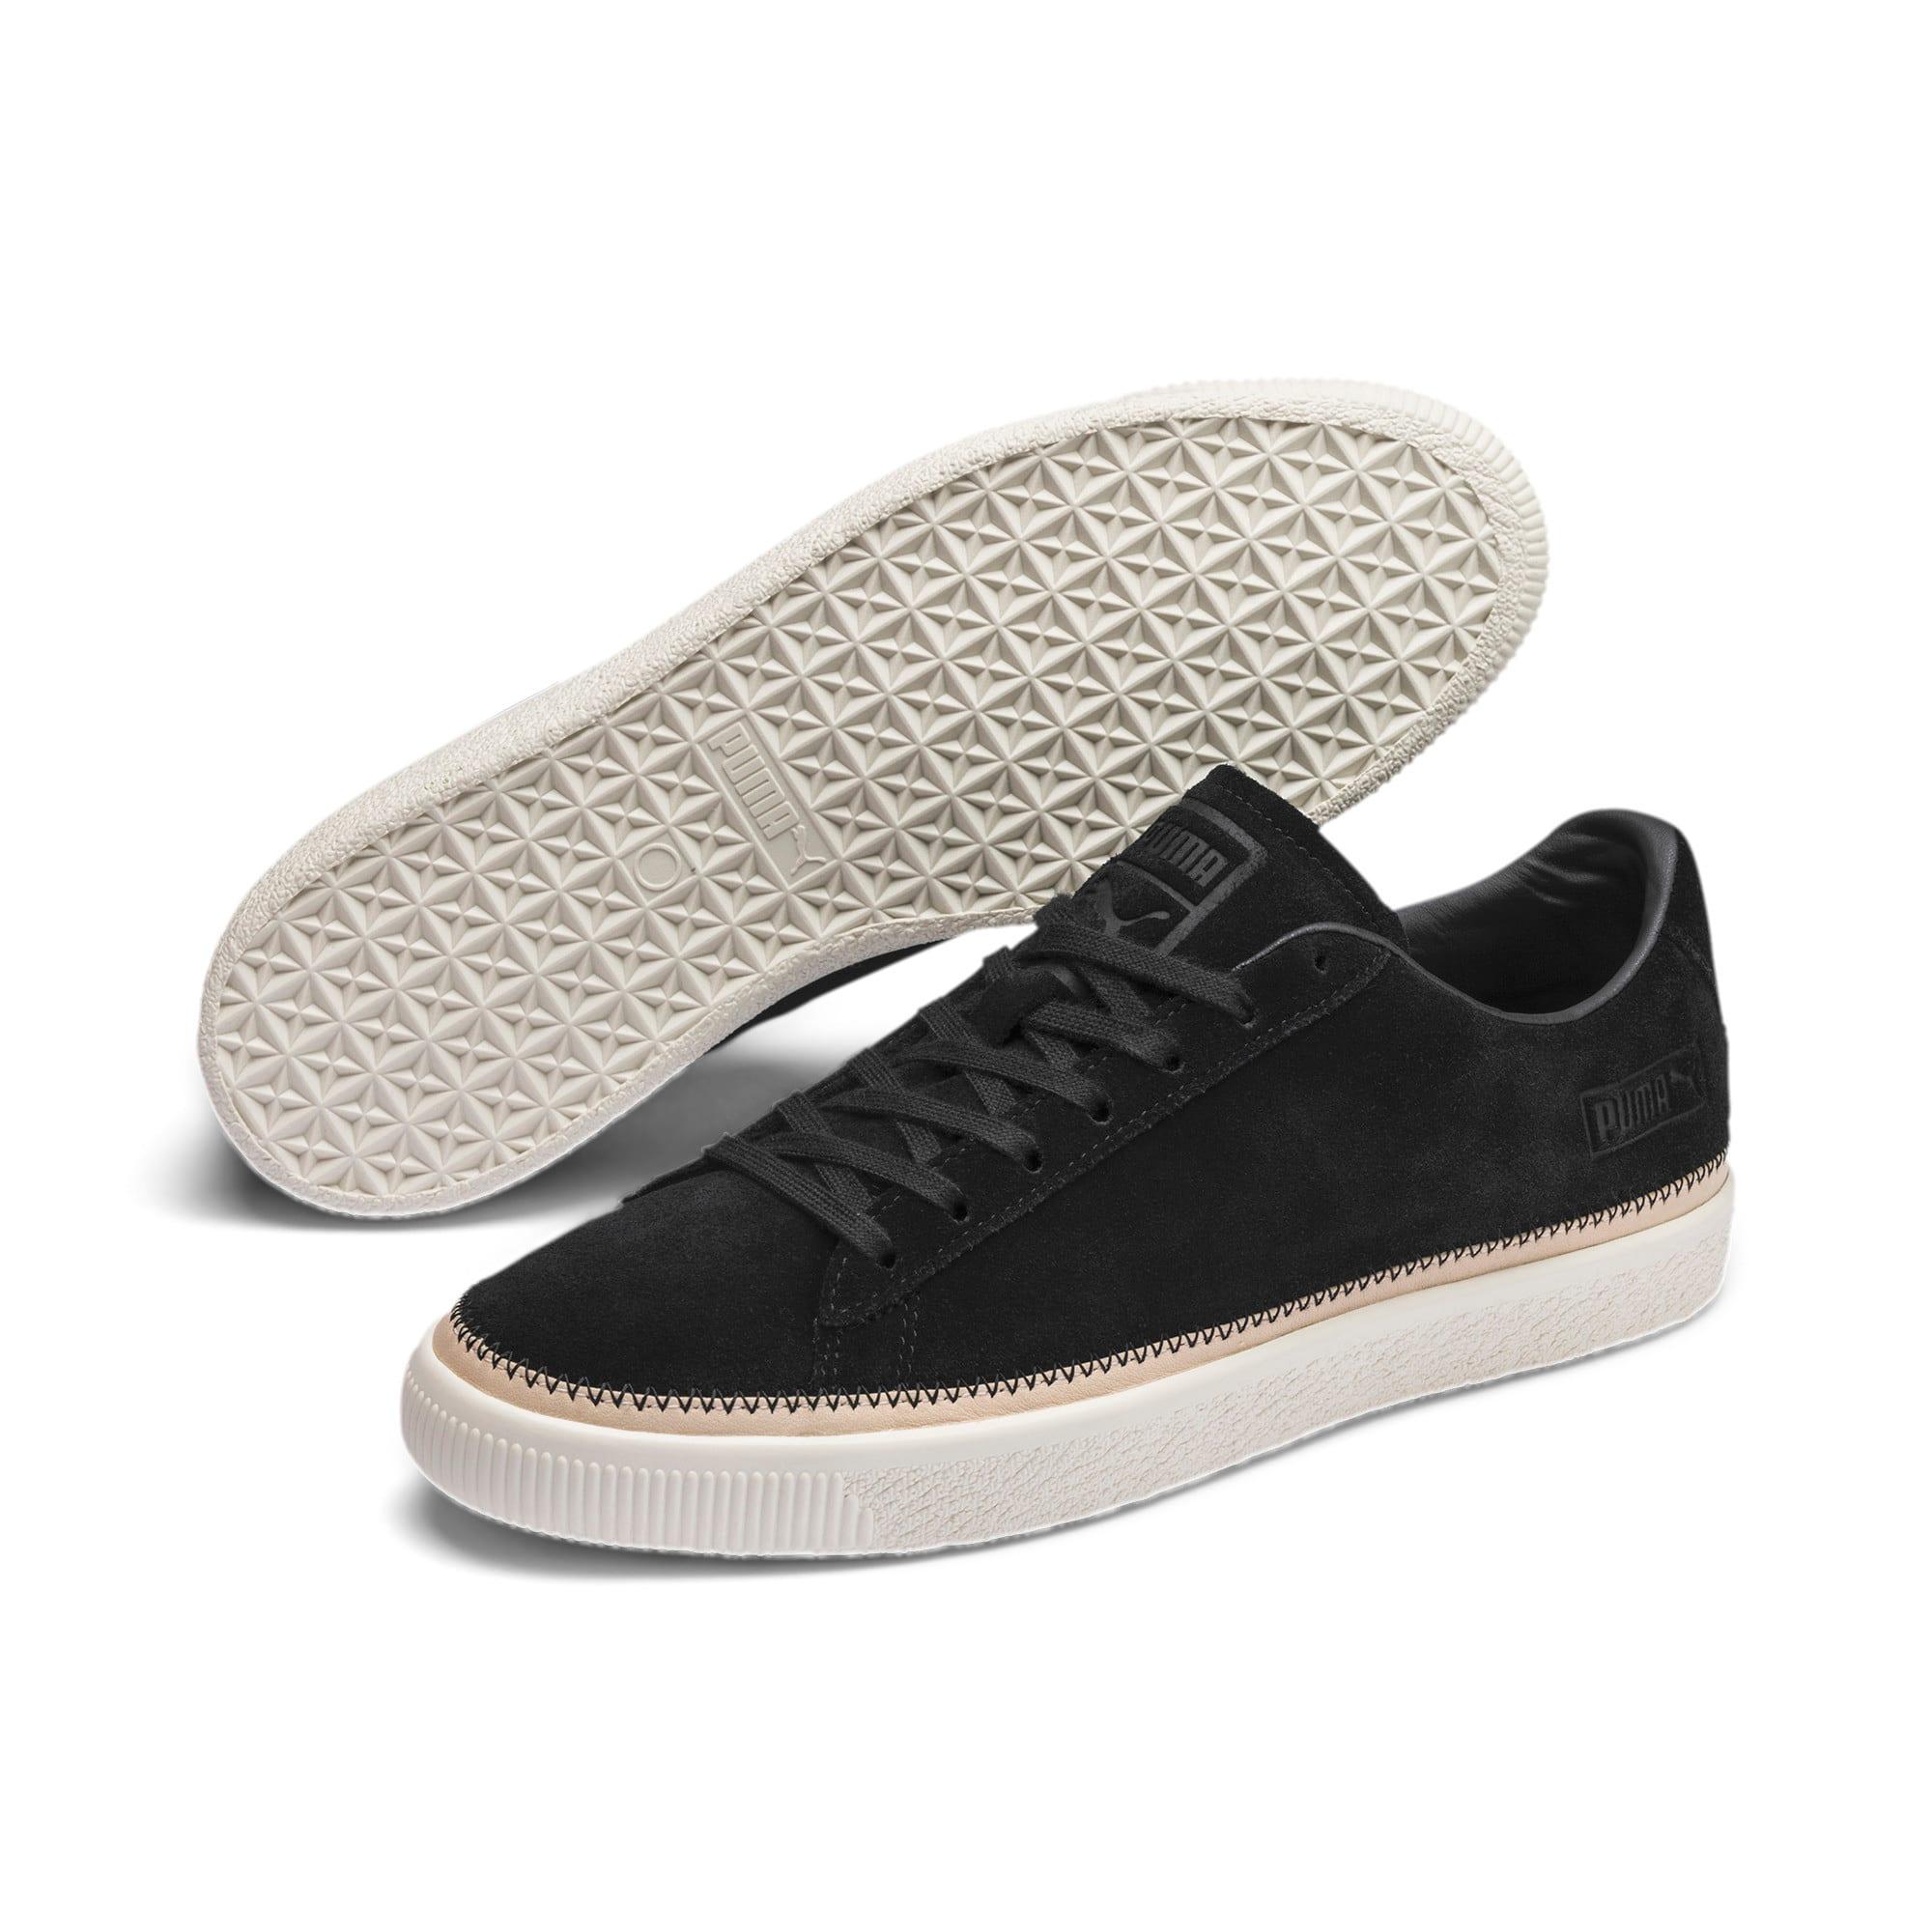 Thumbnail 3 of Suede Trim PRM Sneakers, Puma Black-Whisper White, medium